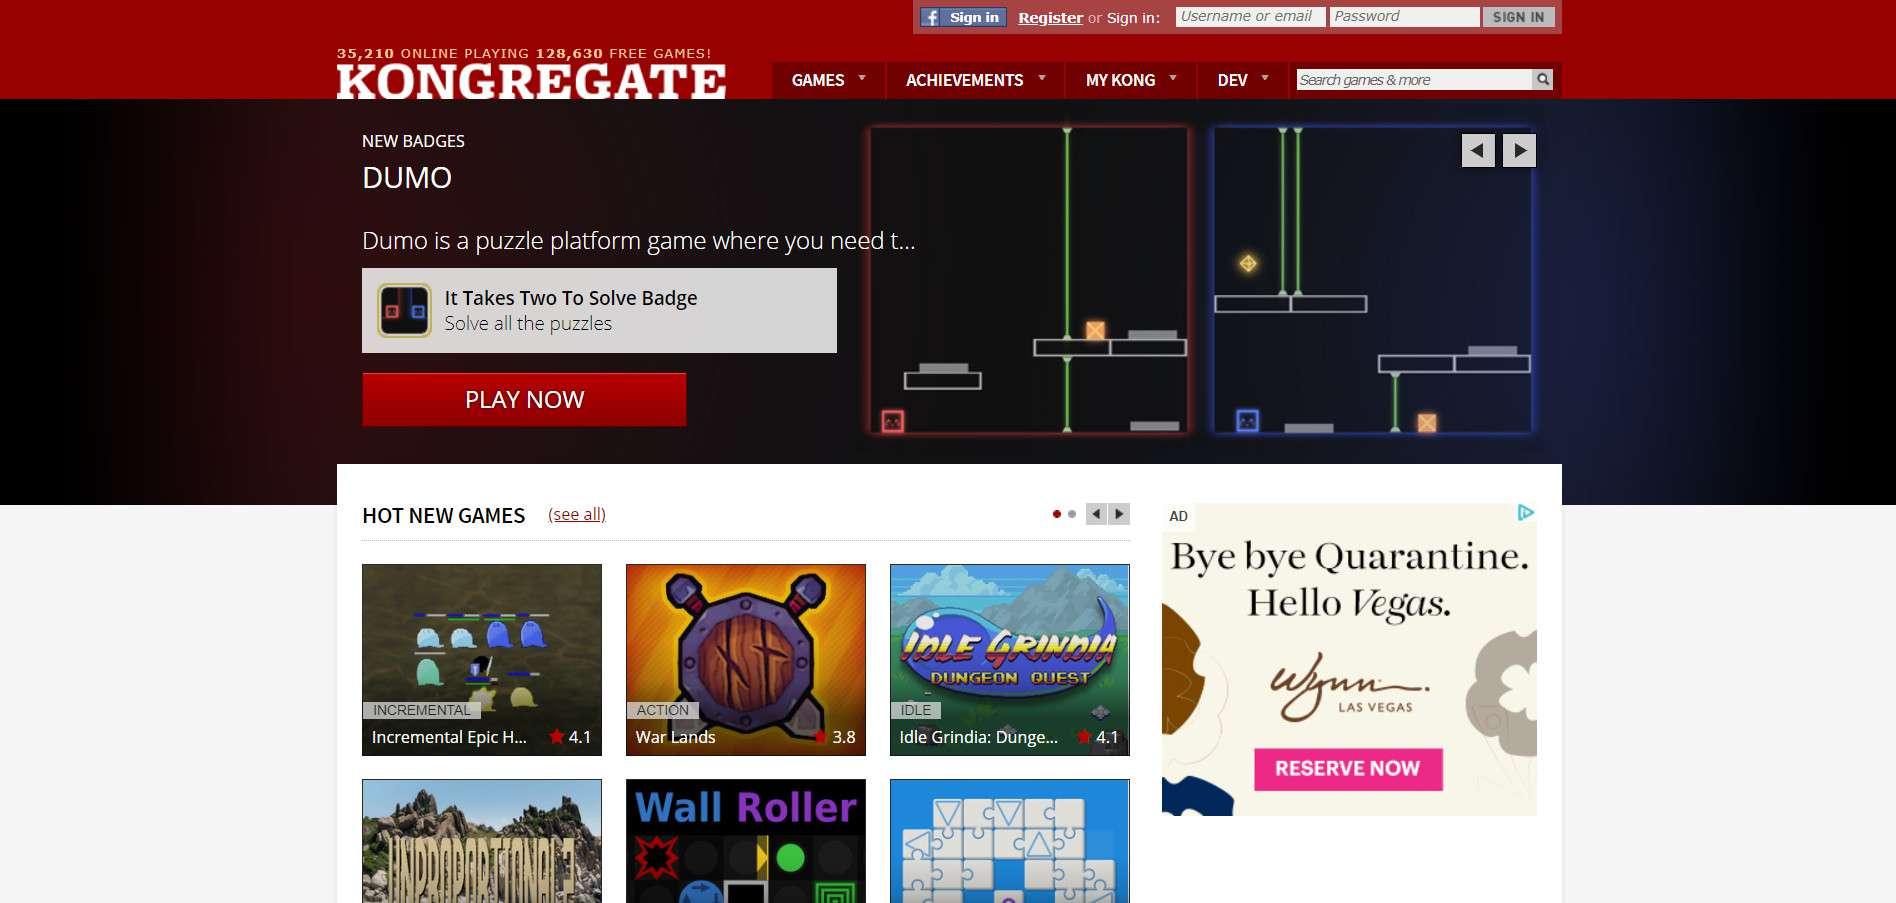 The Kongregate homepage